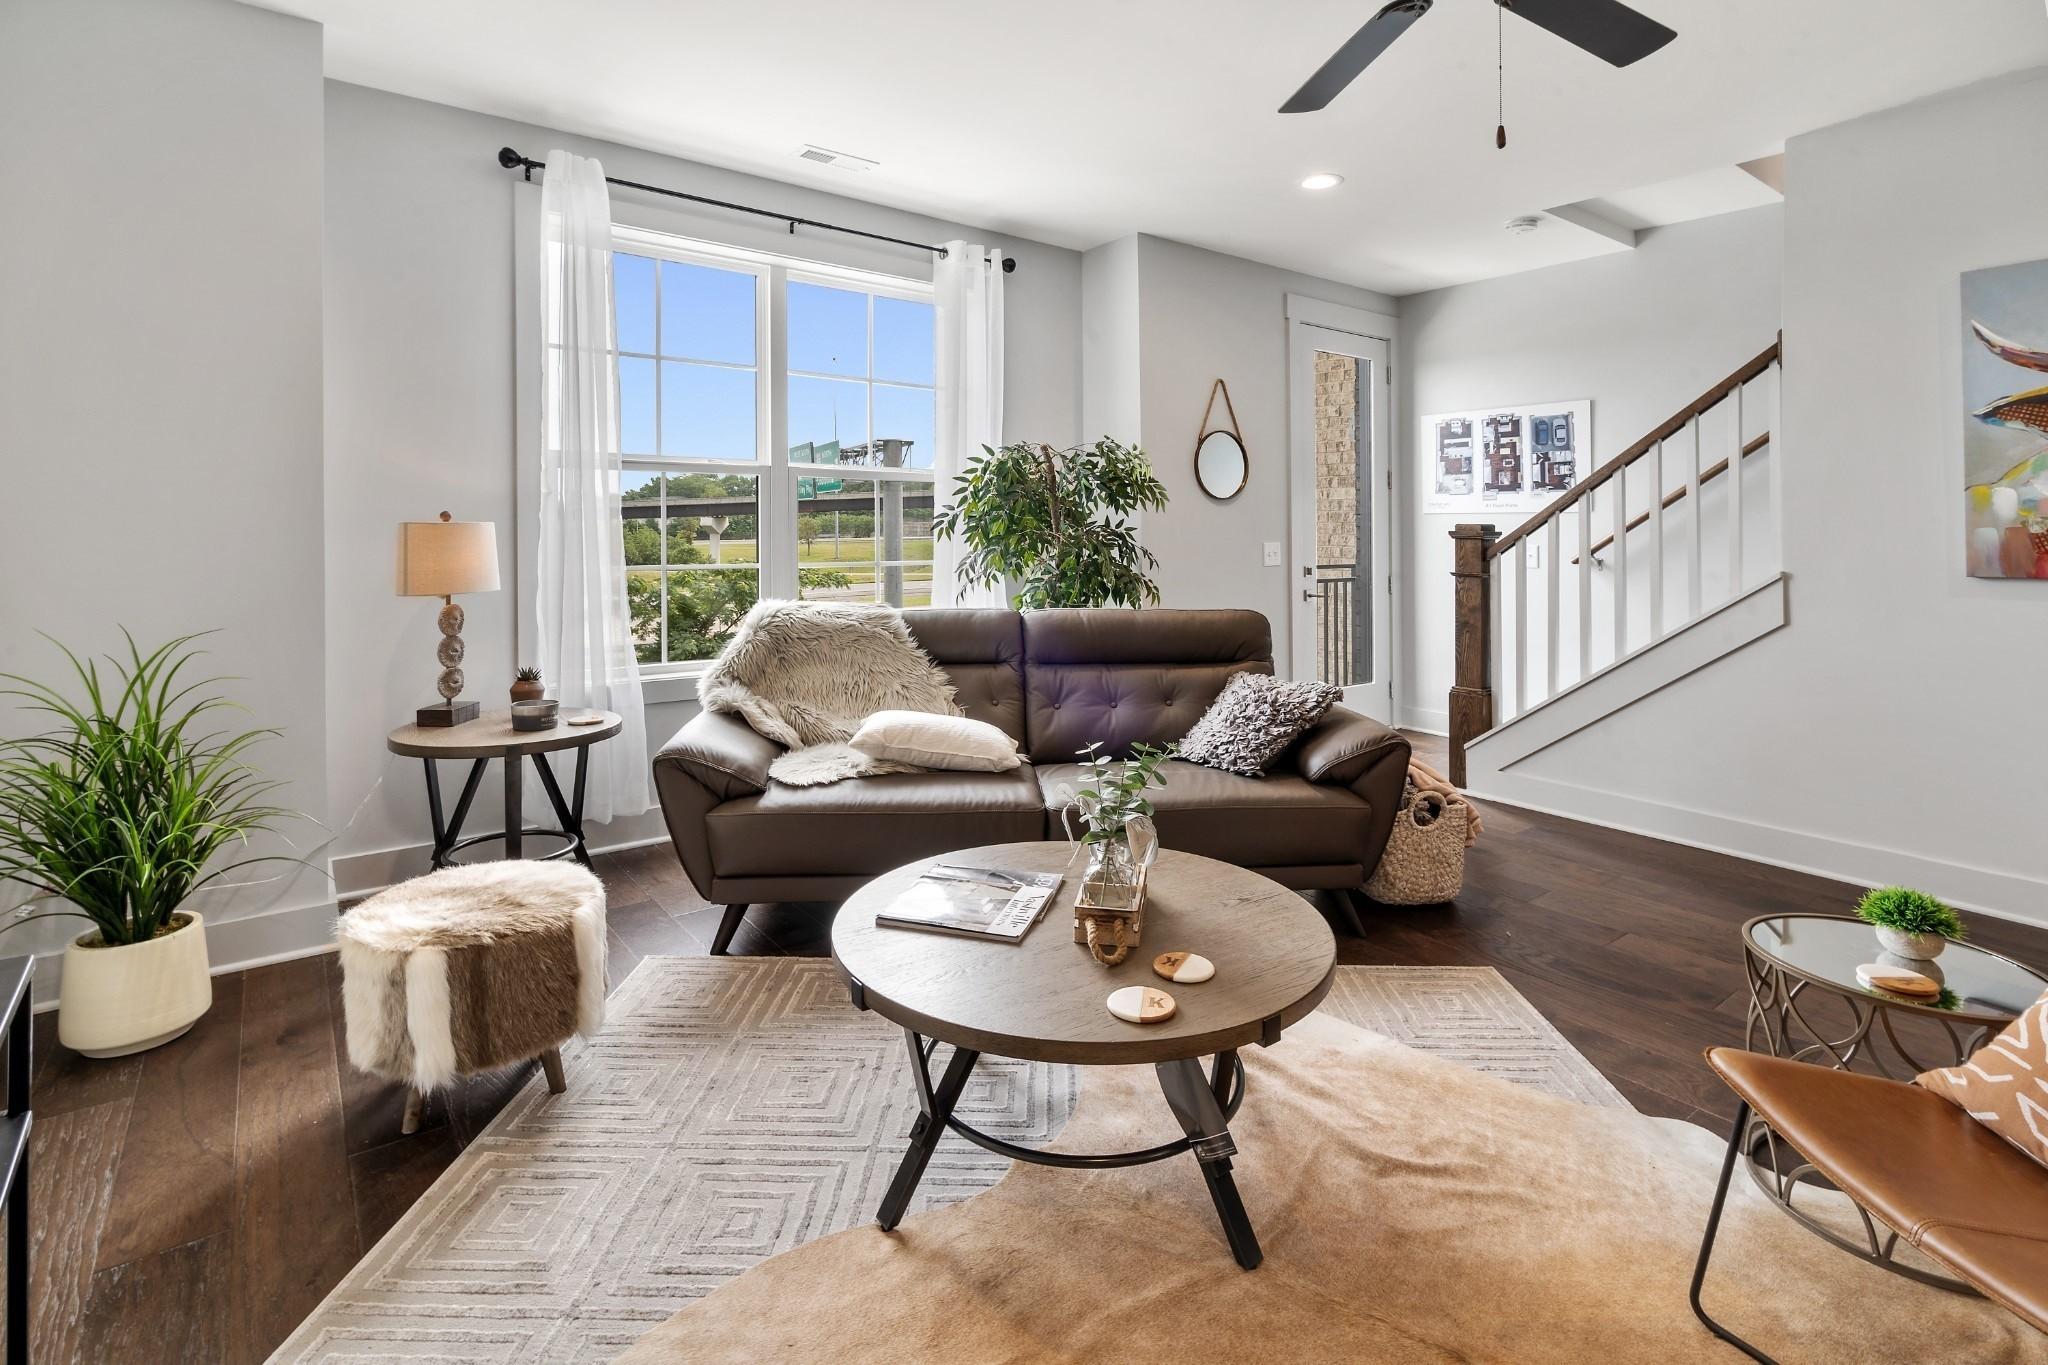 730 Inspiration Blvd Property Photo - Madison, TN real estate listing